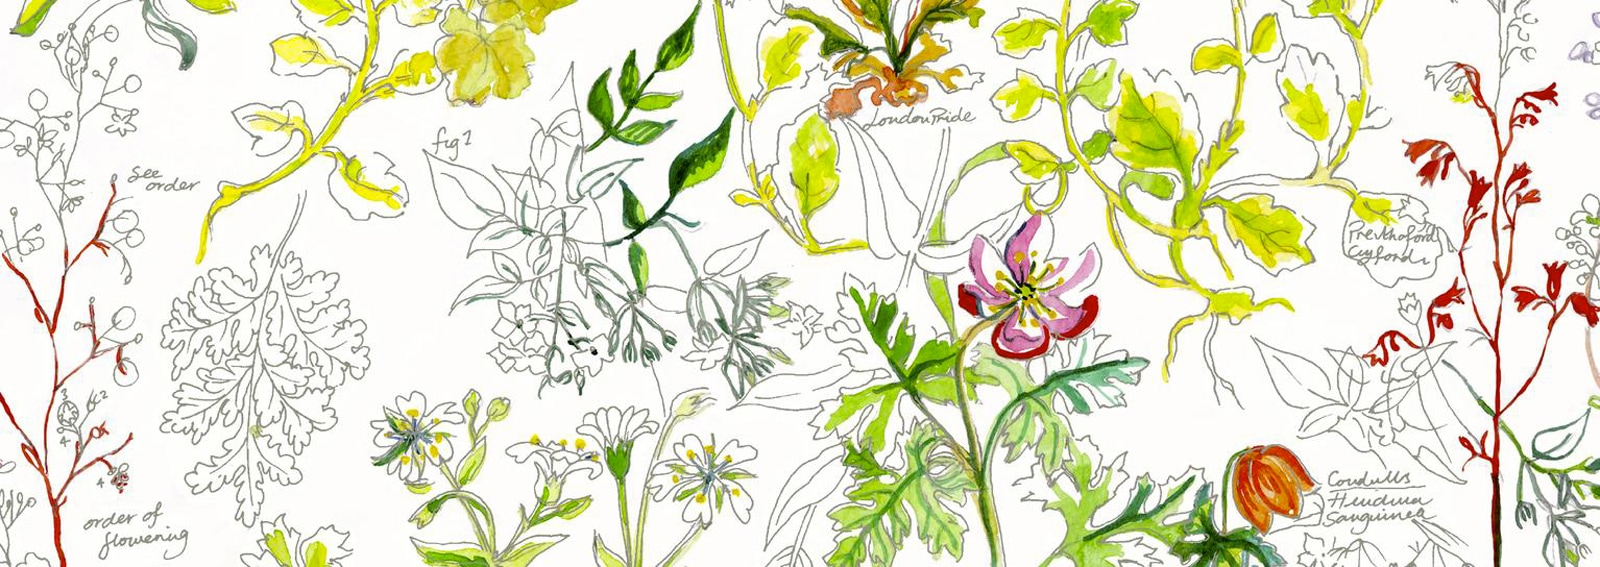 nikecourt-liberty-collection-stampa-fiori-hero